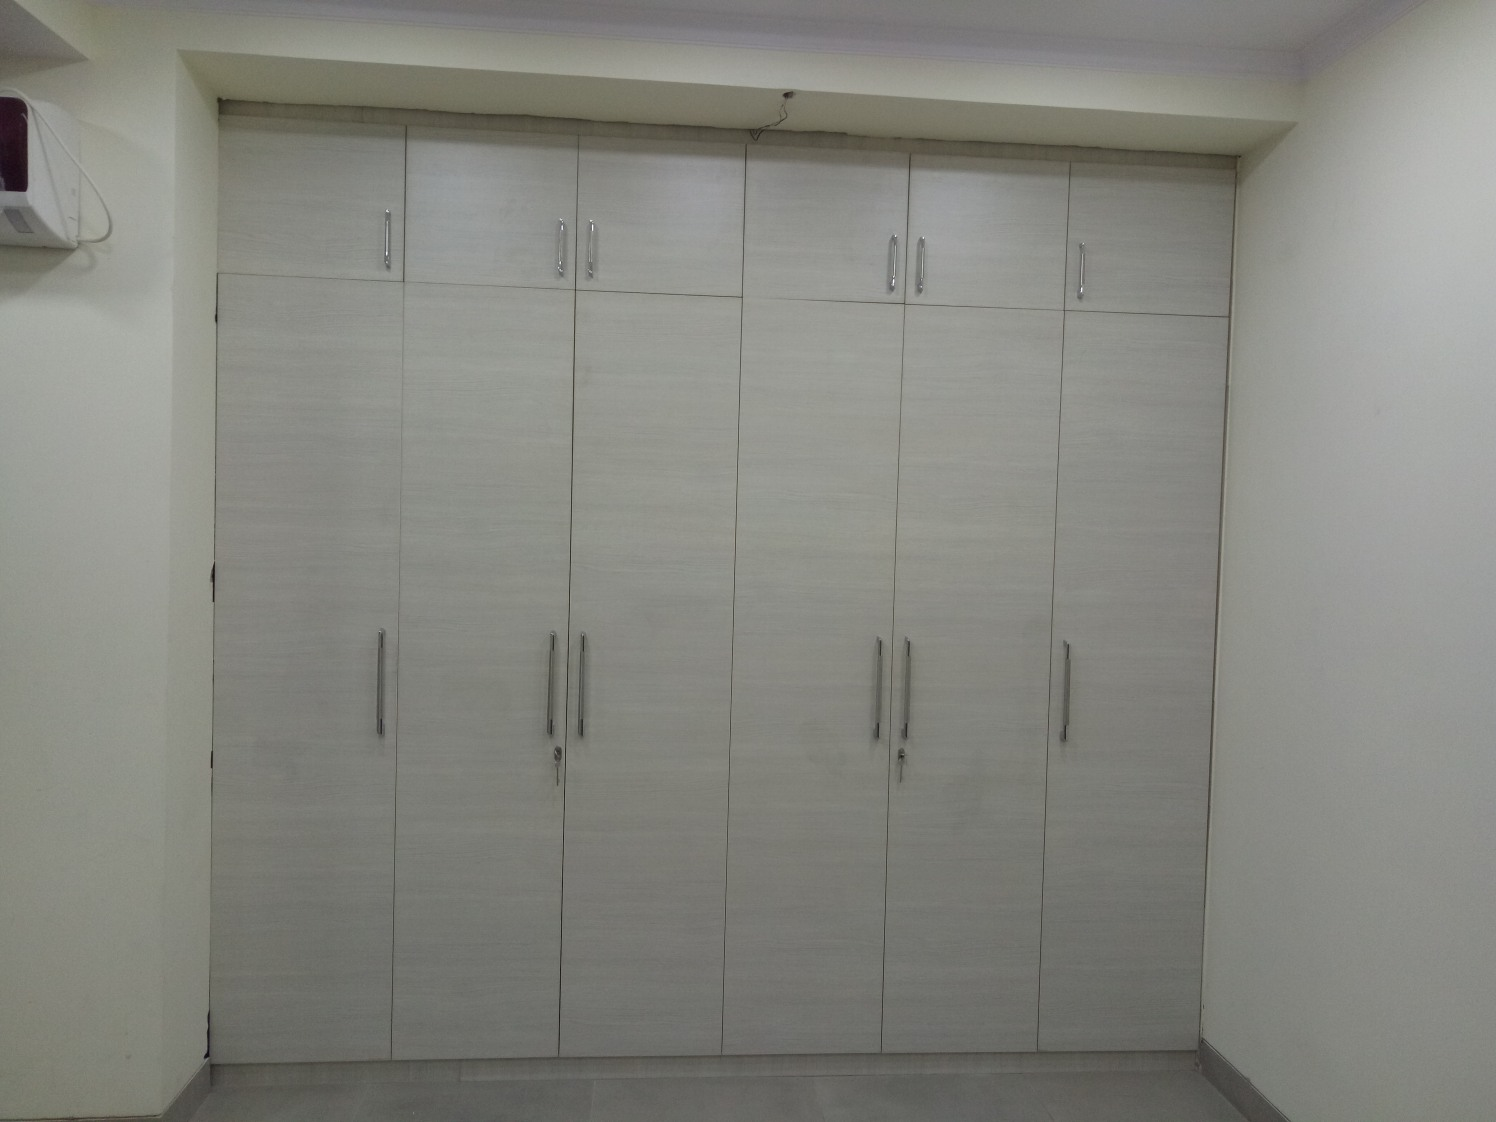 Full Wall Wardrobe For Bedroom by Amit Sharma  Bedroom Contemporary | Interior Design Photos & Ideas